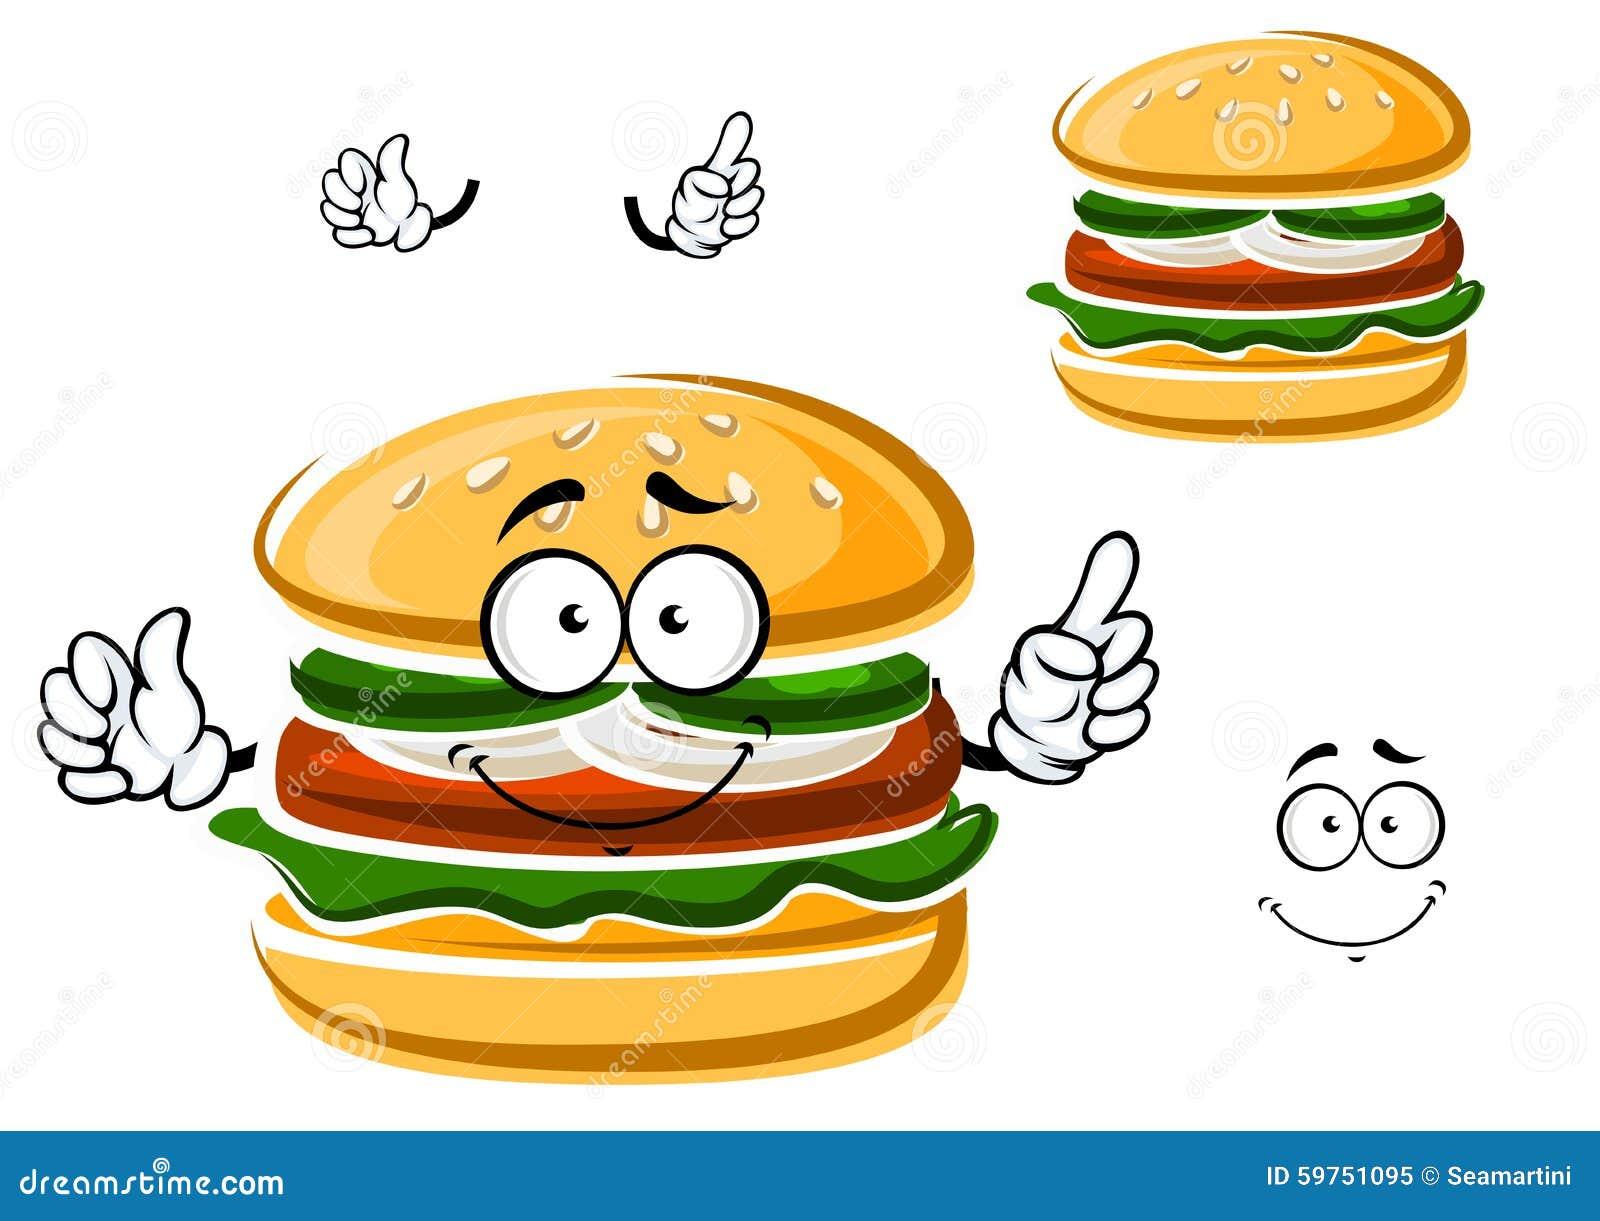 cartoon funny hamburger with vegetables stock vector